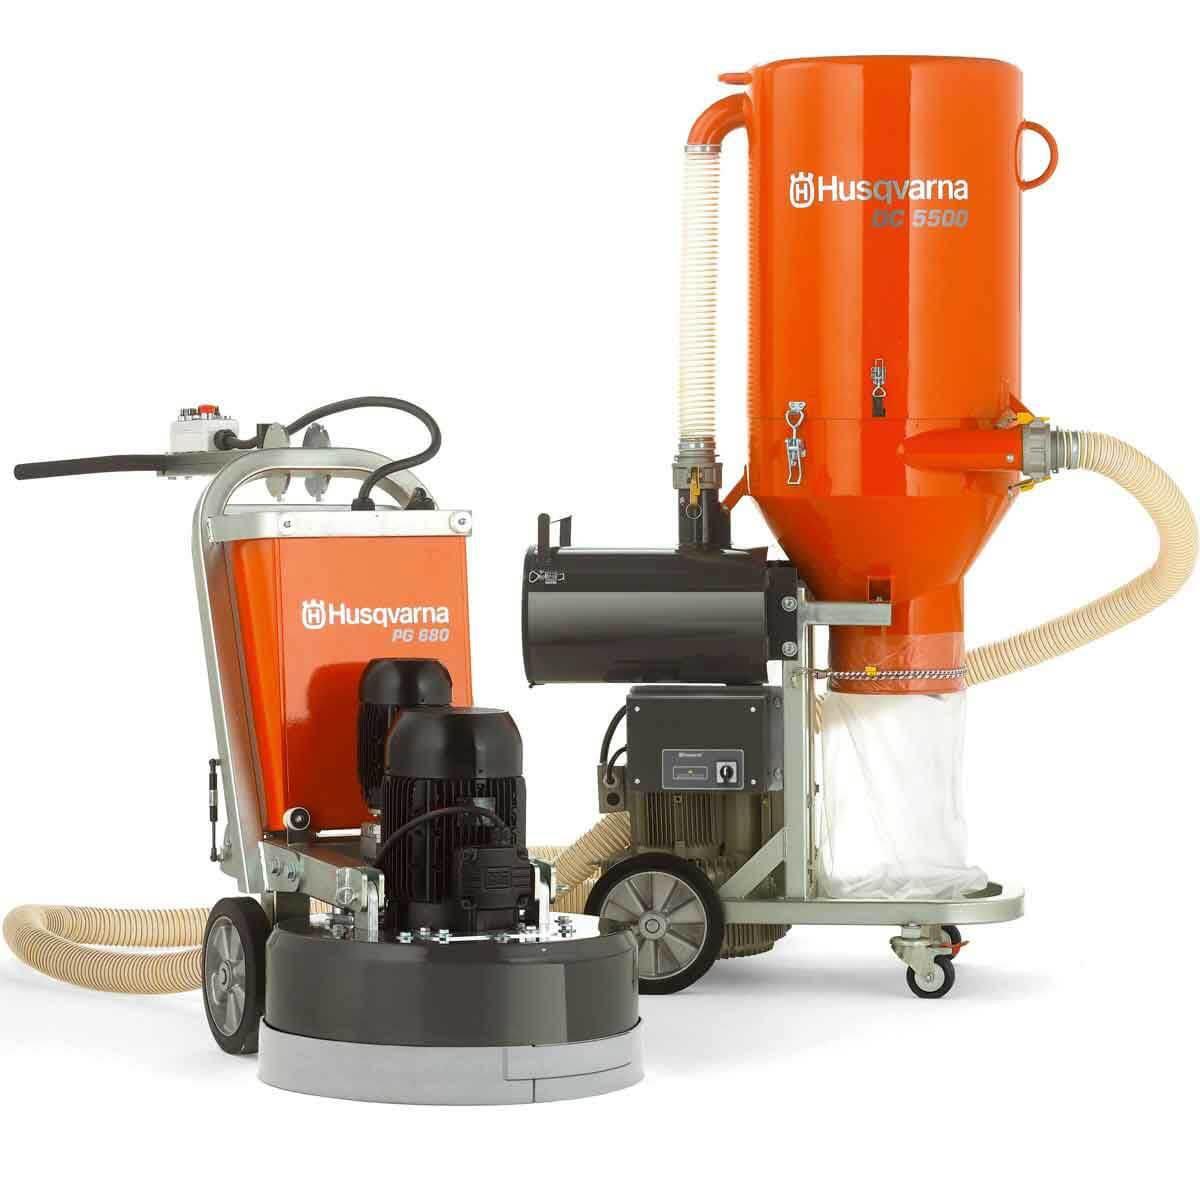 Husqvarna PG 820 Grinder vacuum